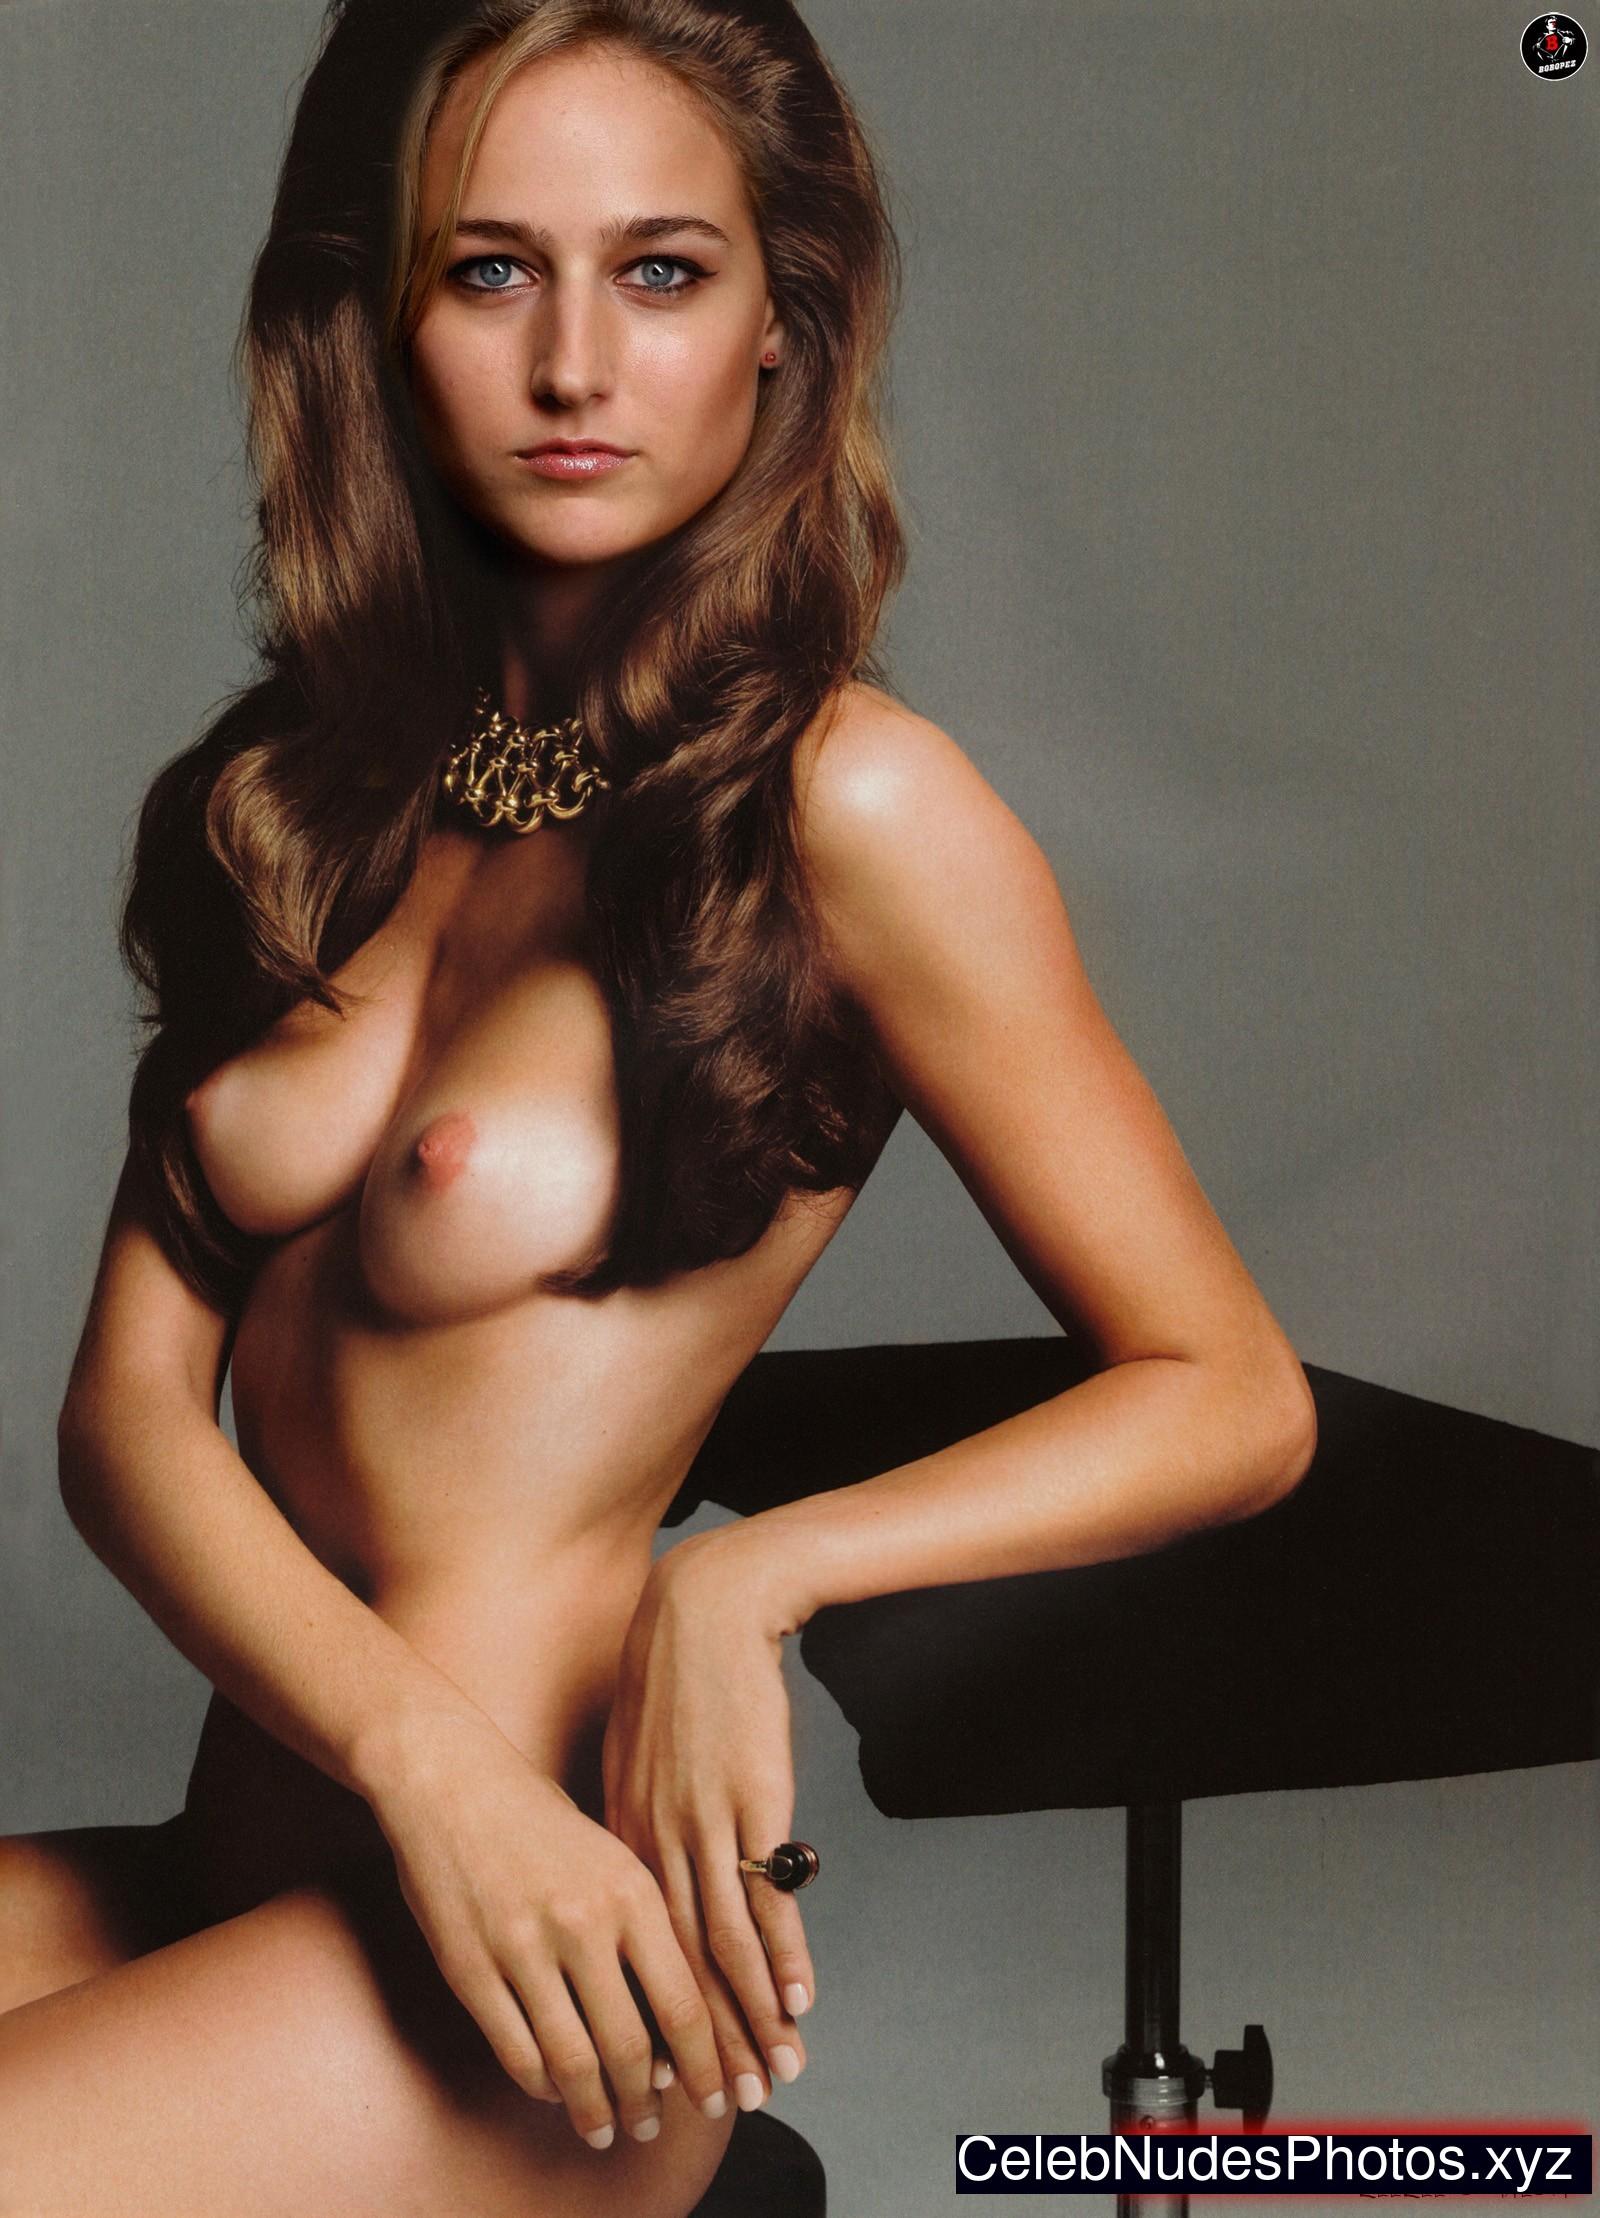 Leelee Sobieski celebrity nude pics